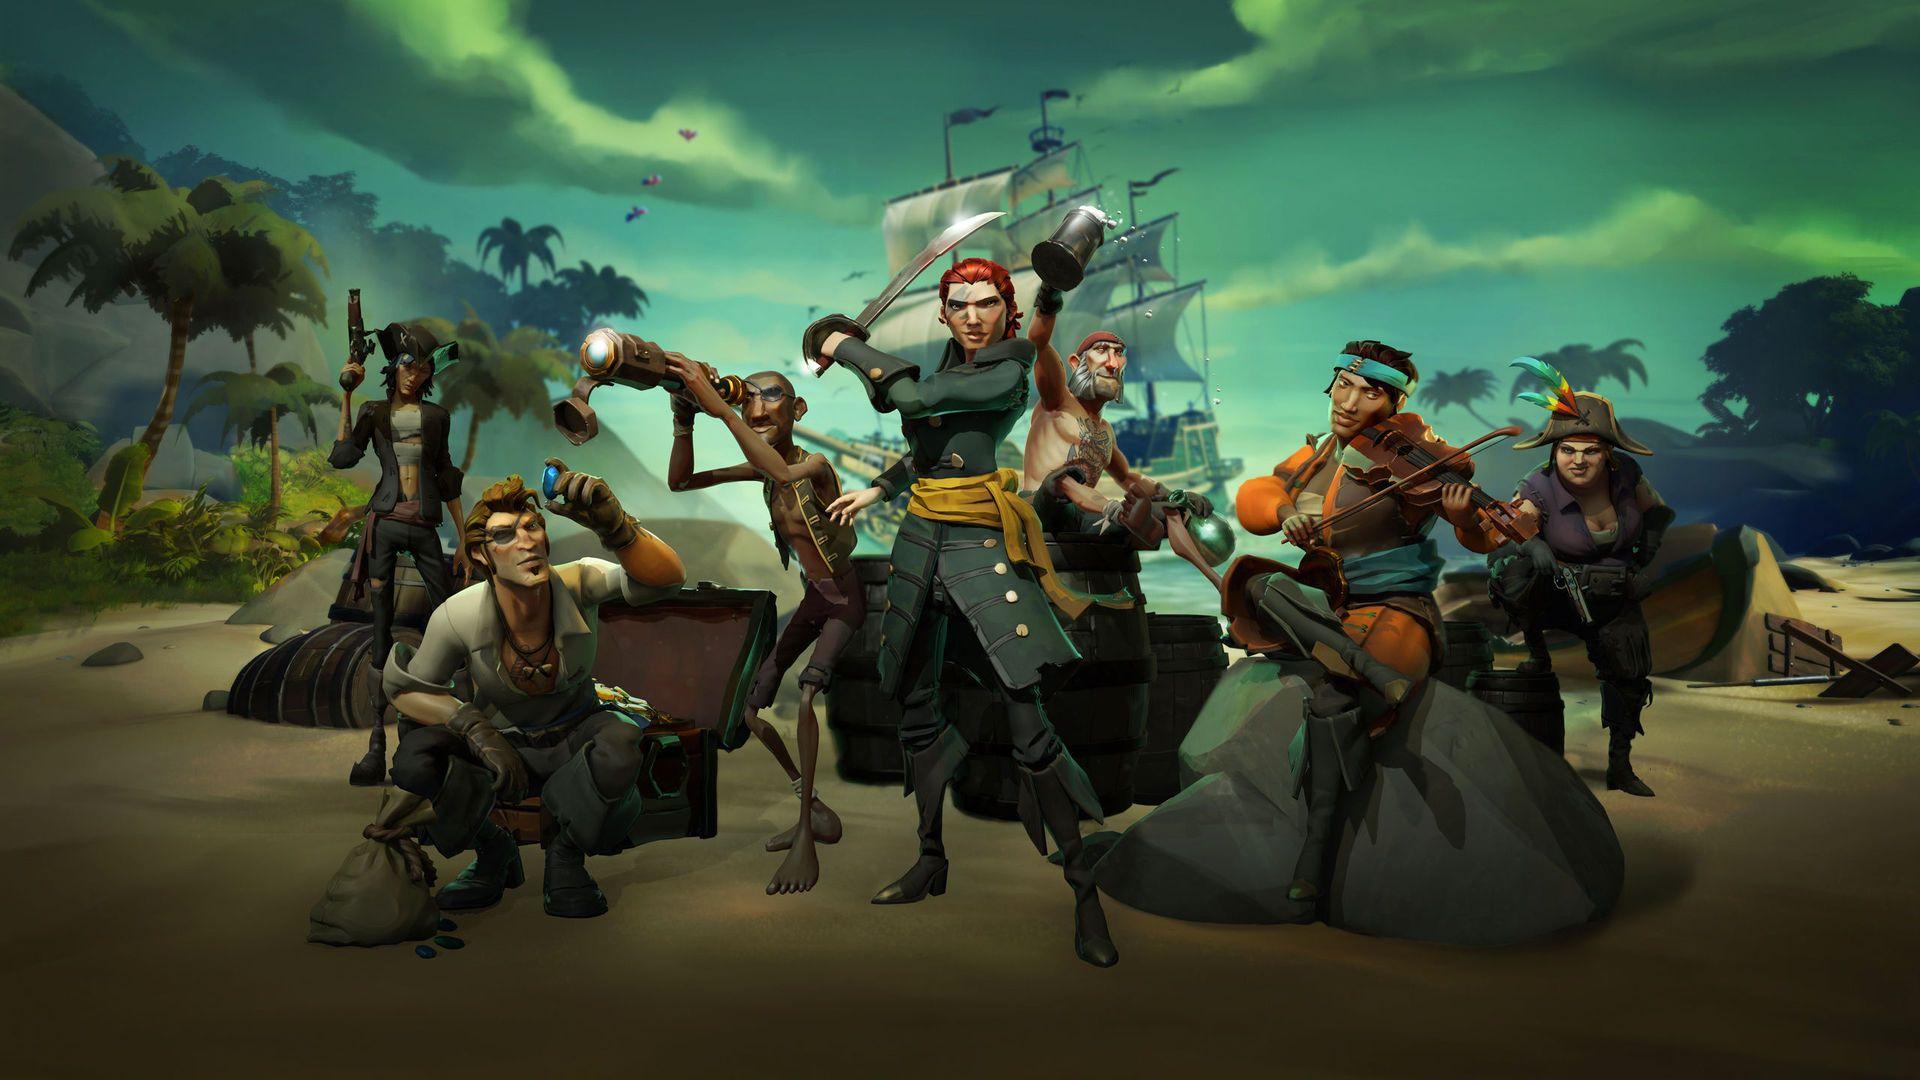 Sea Of Thieves Xboxone Seaofthieves Games Videogames Ships Piratas Juegos De Simulacion Xbox One Piratas